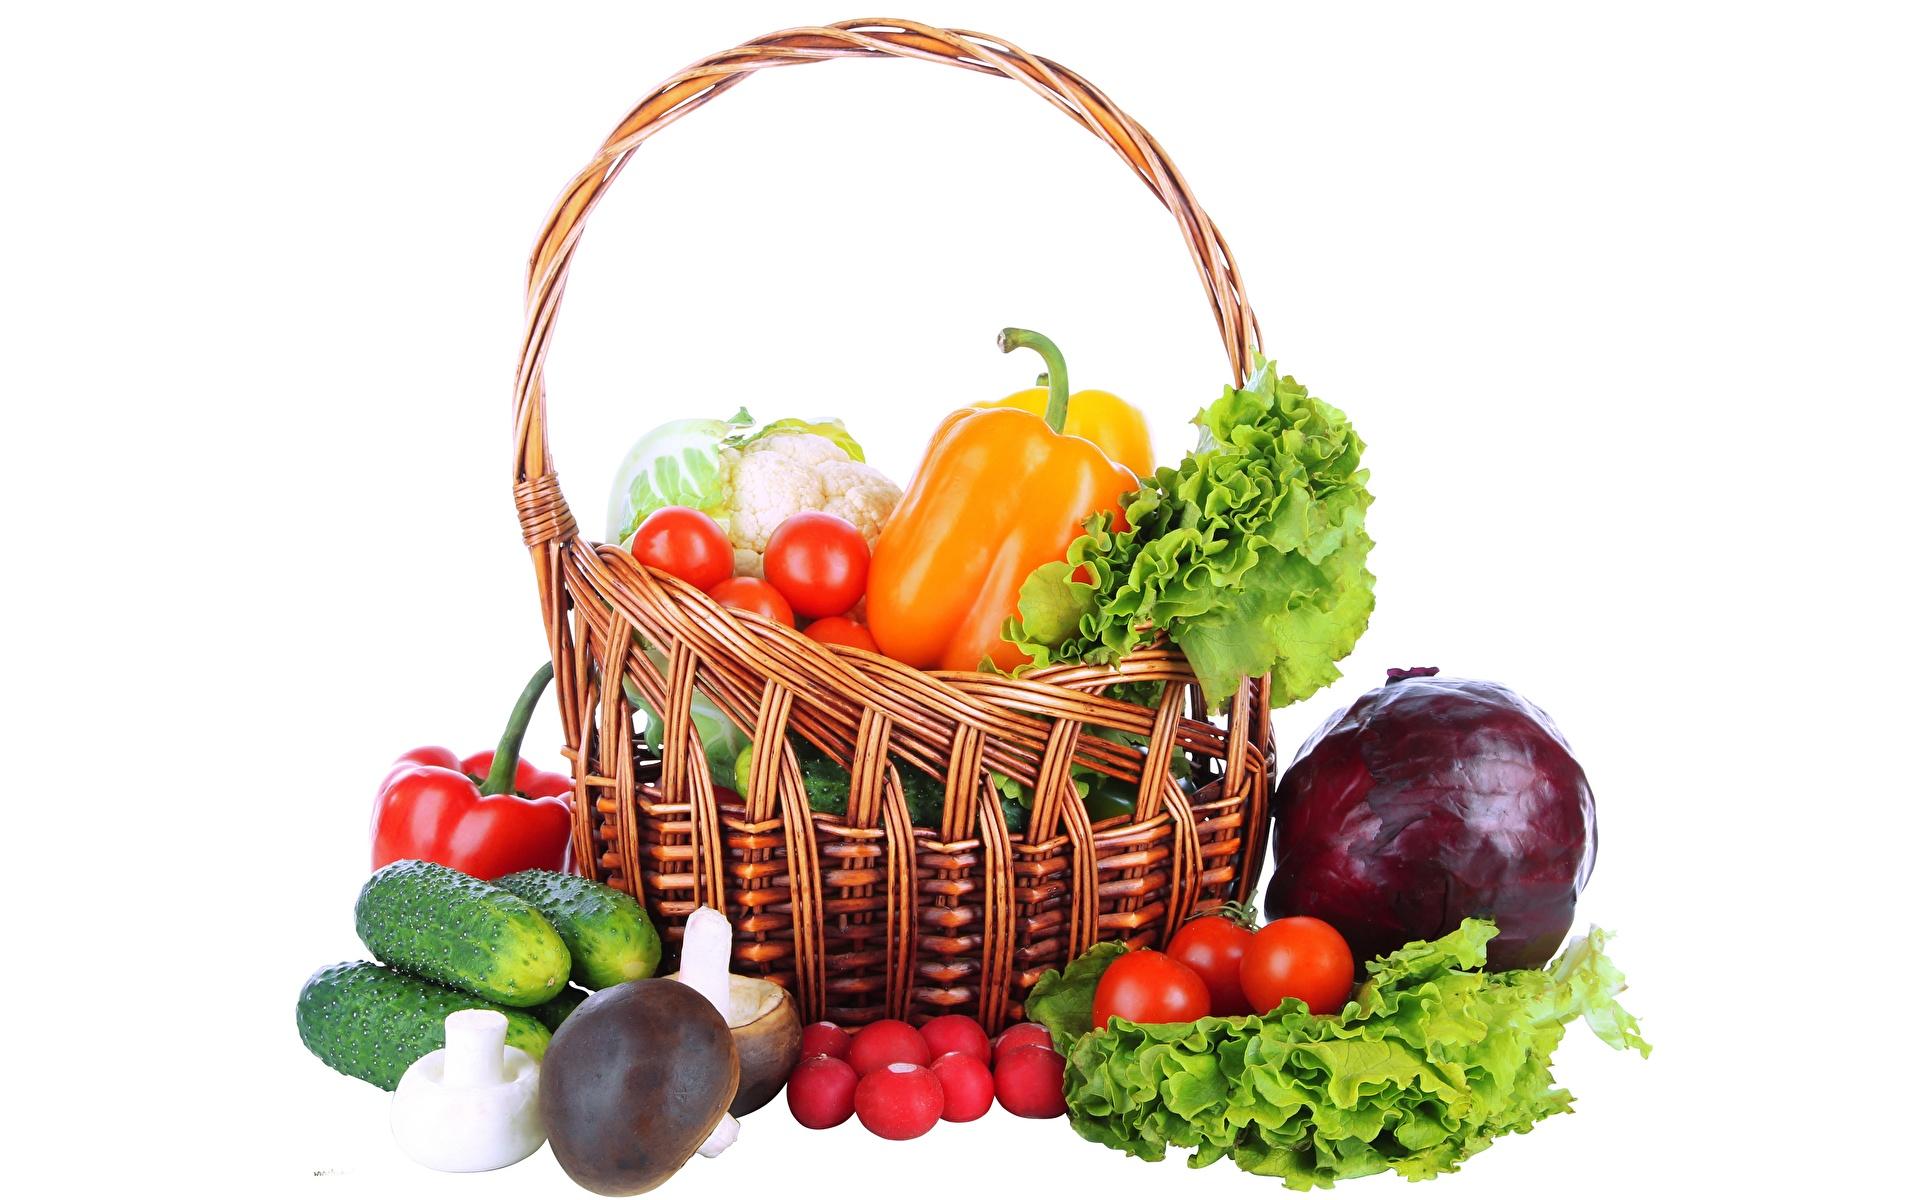 Картинка Корзинка Пища Овощи белым фоном 1920x1200 Корзина корзины Еда Продукты питания Белый фон белом фоне